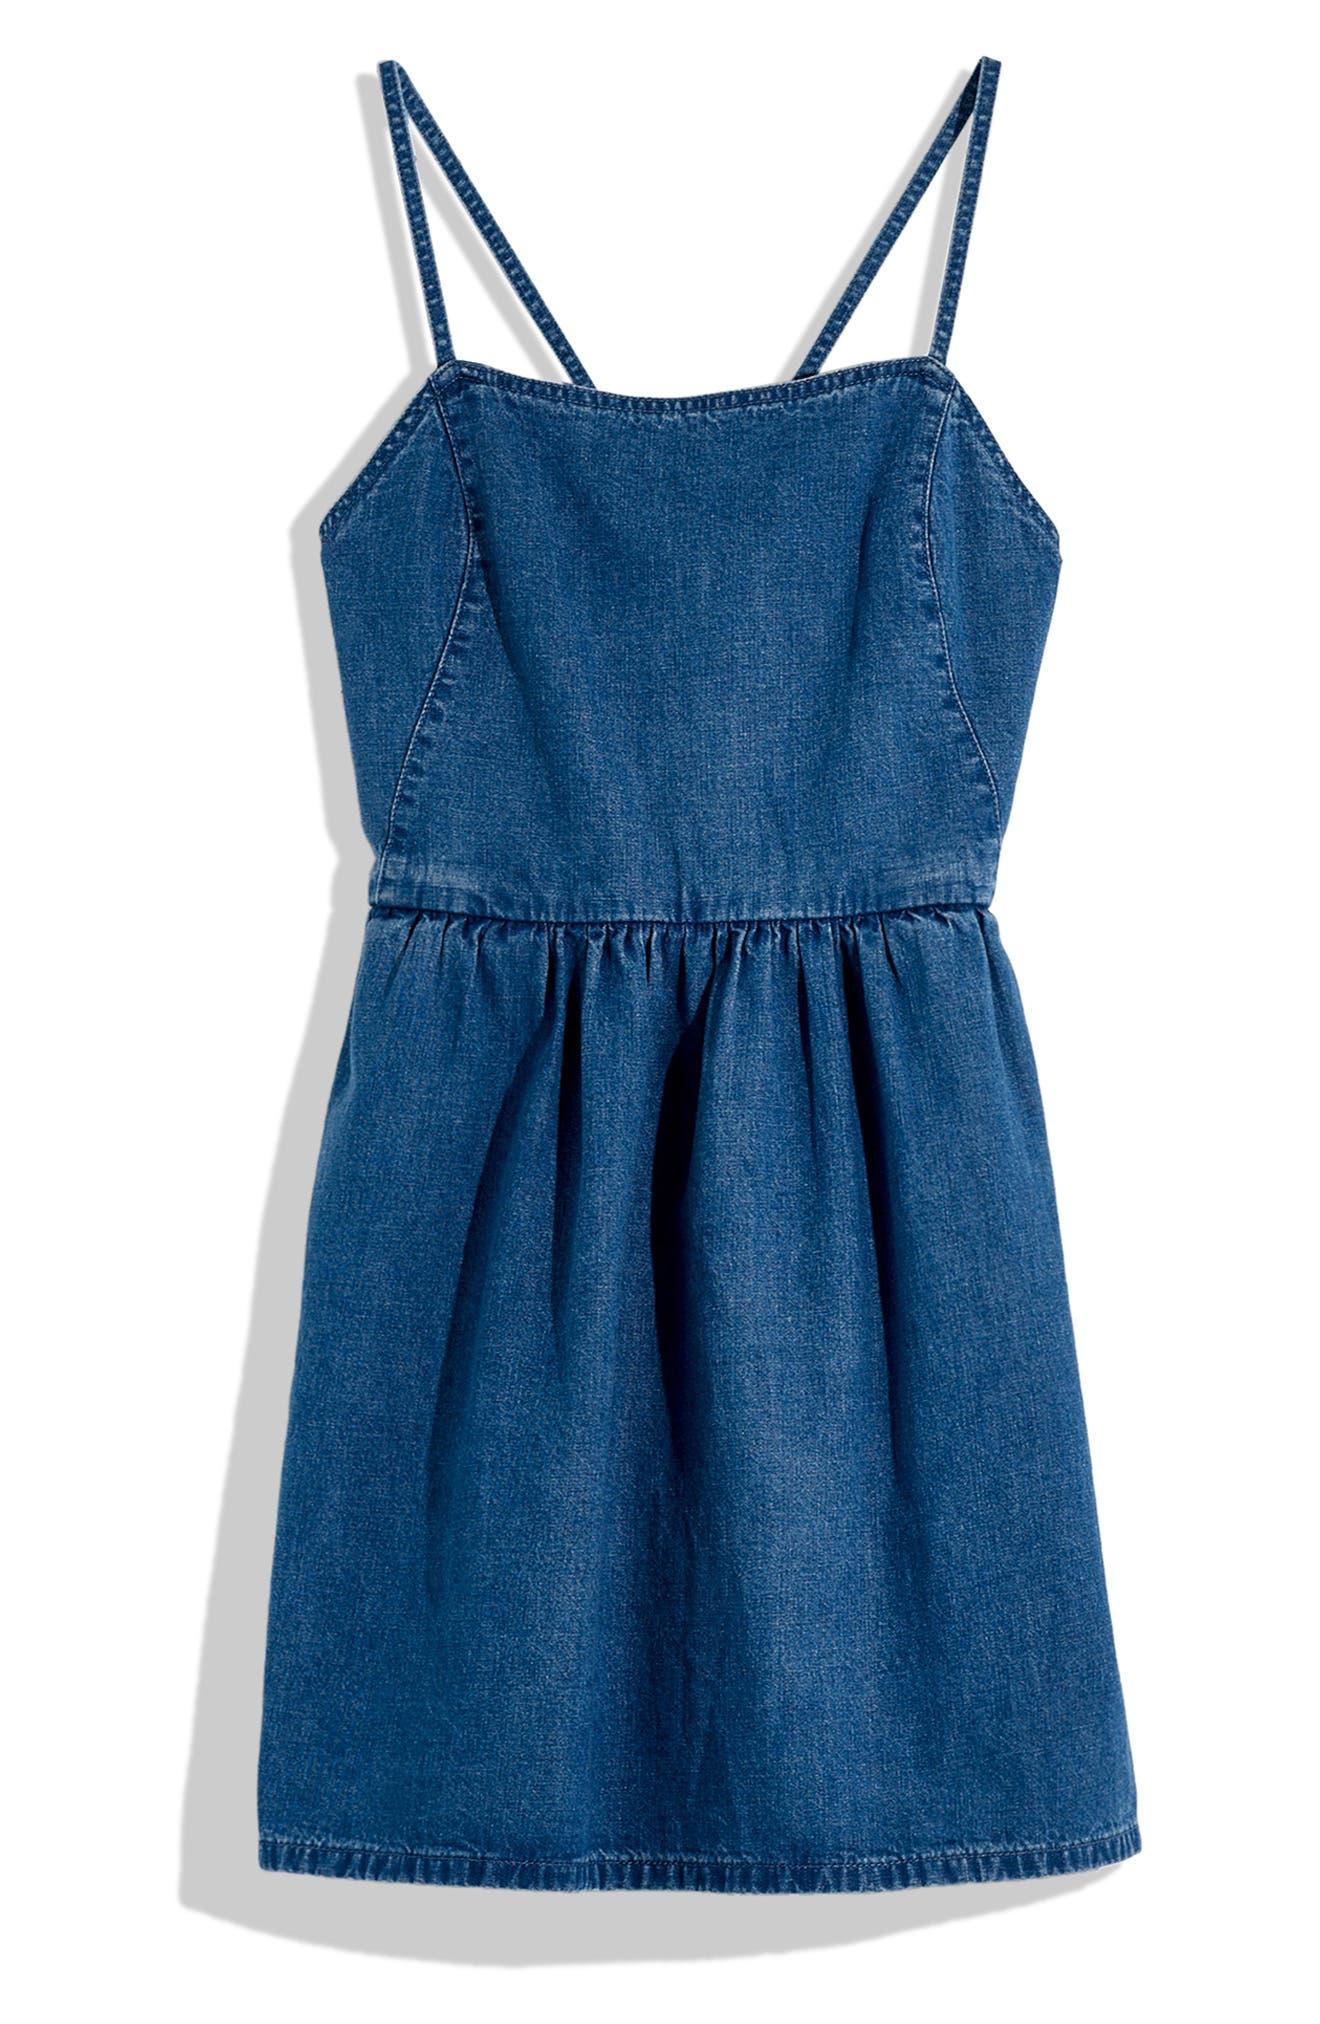 Madewell Denim Apron Dress